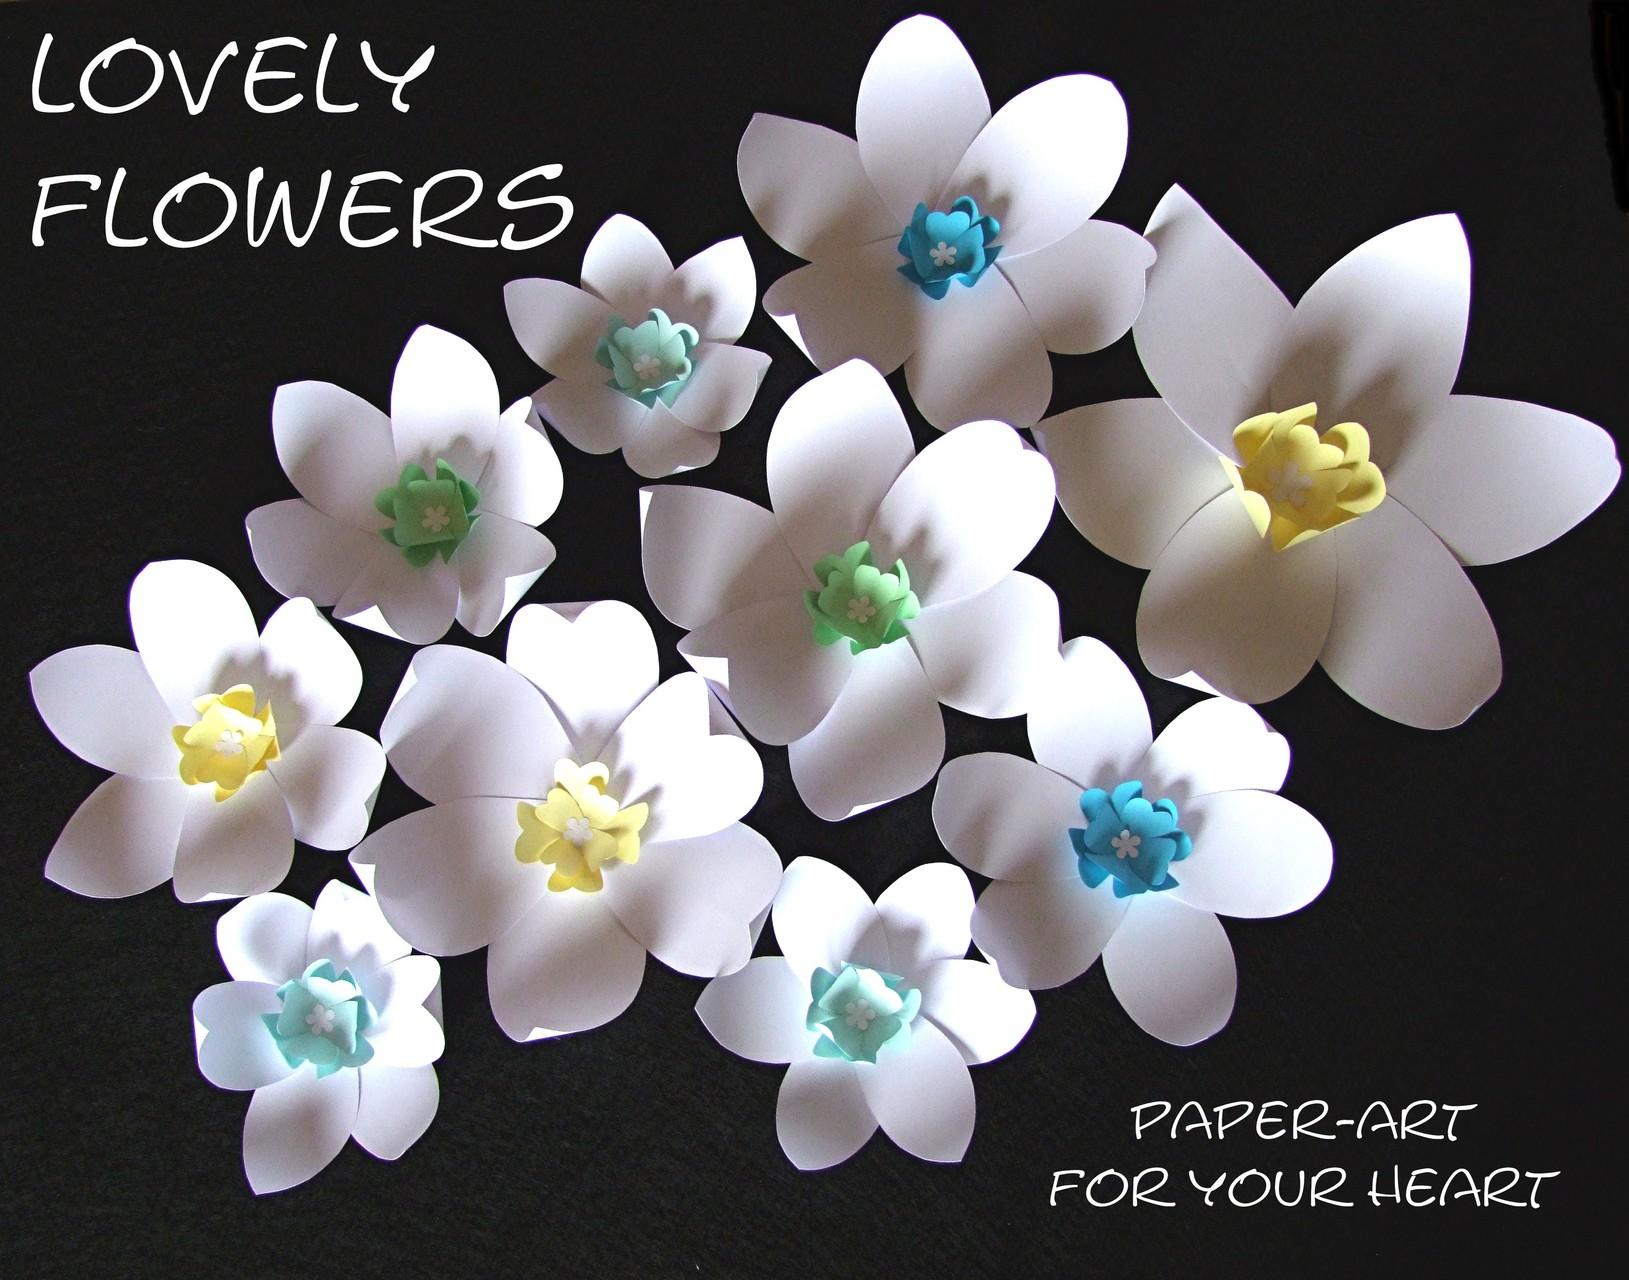 www.lovelyflowers.de - Dein Spezialist für PAPER-ART DIY-Blüten-Wandtattoos in 3D!